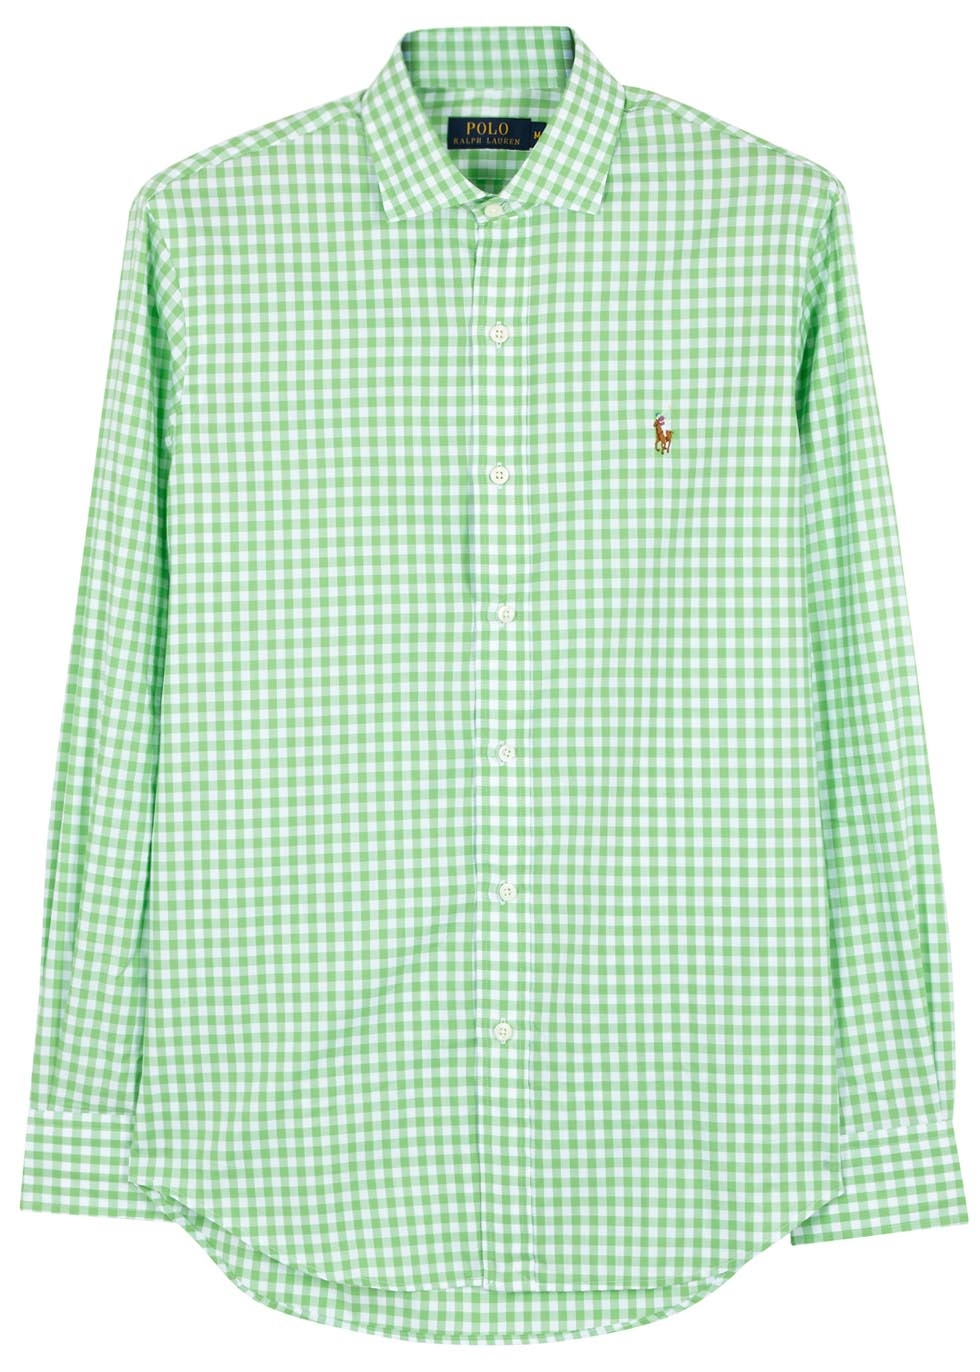 de0b1b529 ... france polo ralph lauren bright green checked cotton shirt in green for  men ff933 b0d7e